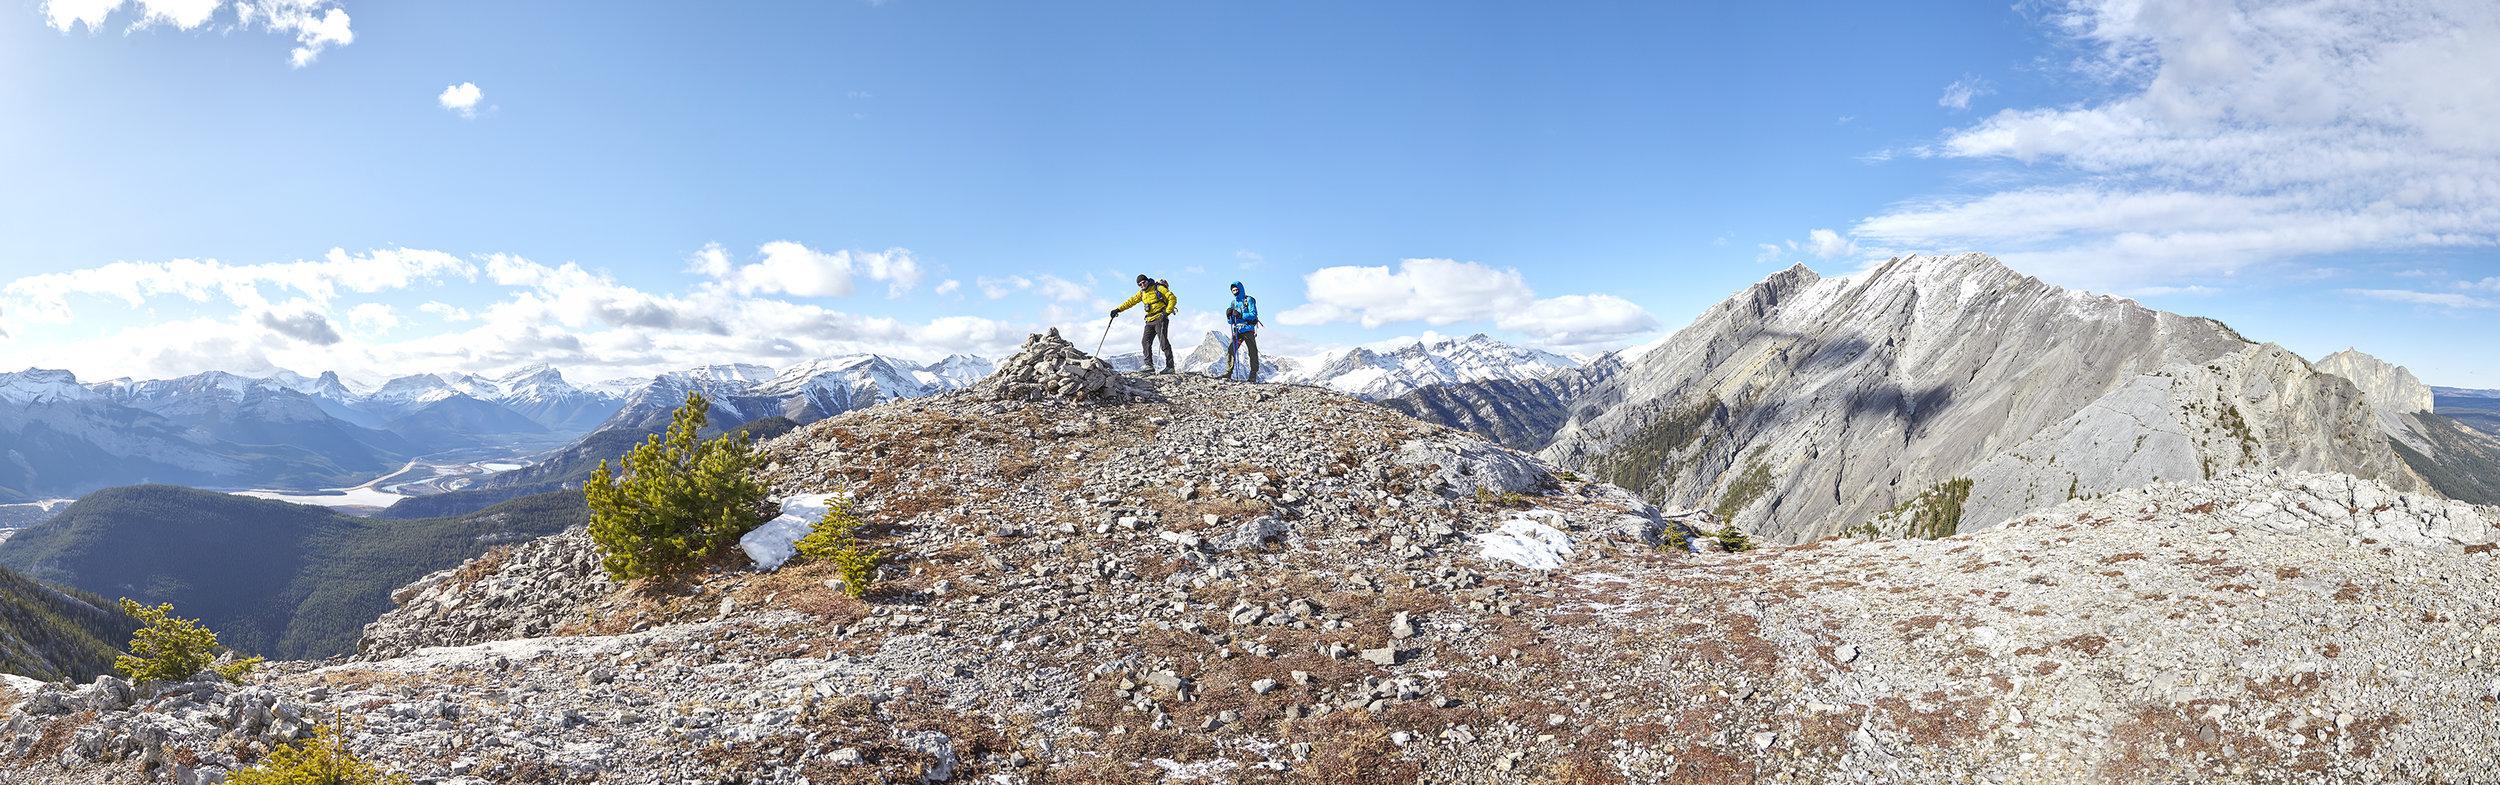 Milan and Yuri on the summit of Loder Peak.